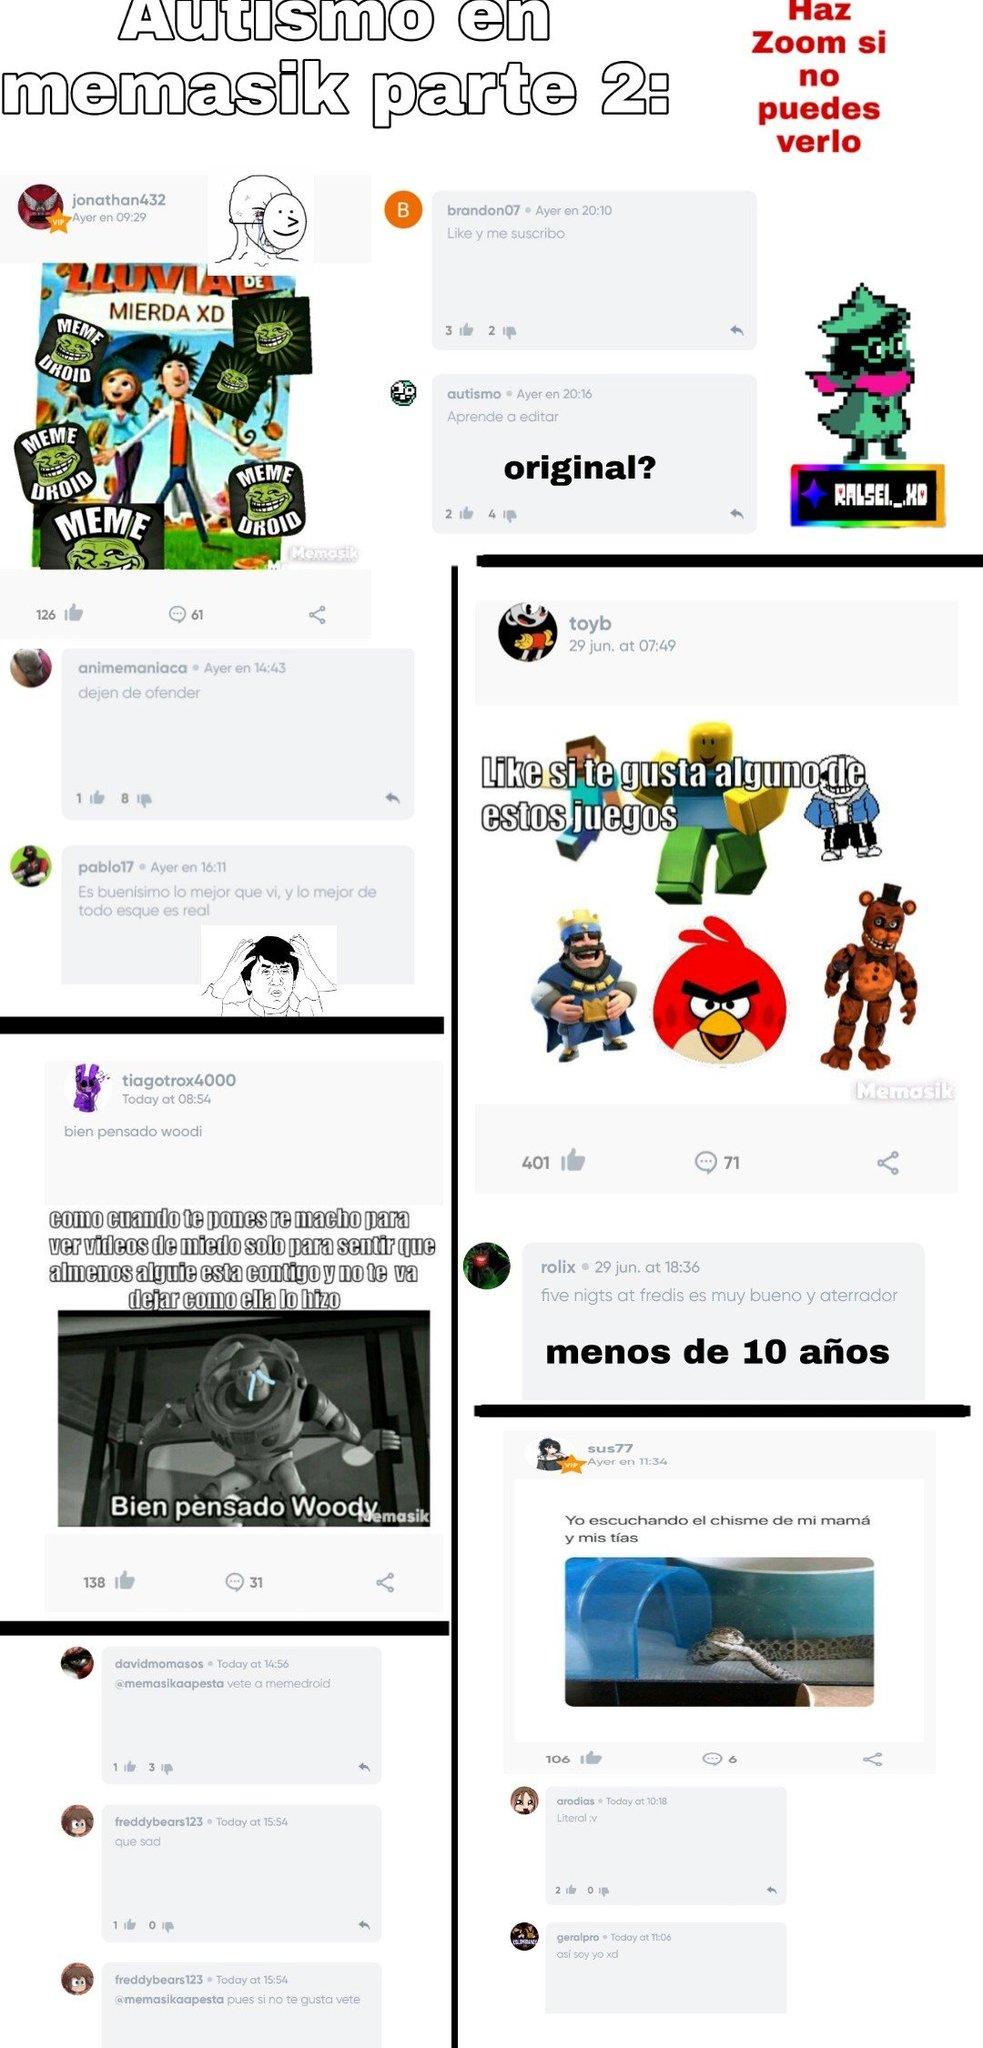 2da Parte - meme